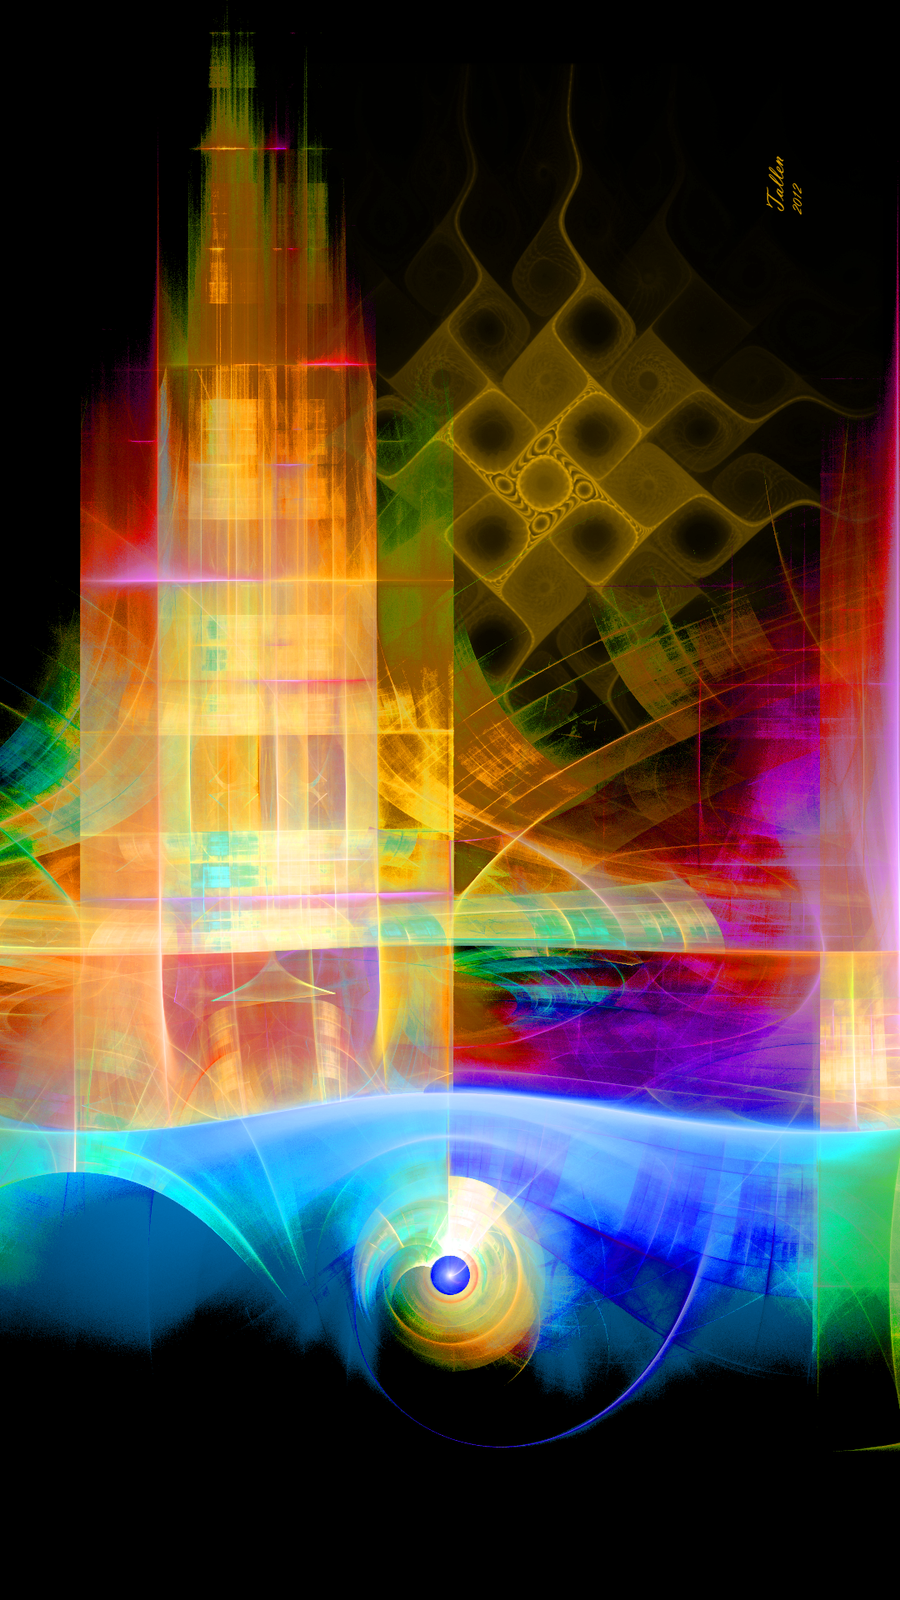 Abstractal IV by Fractamonium